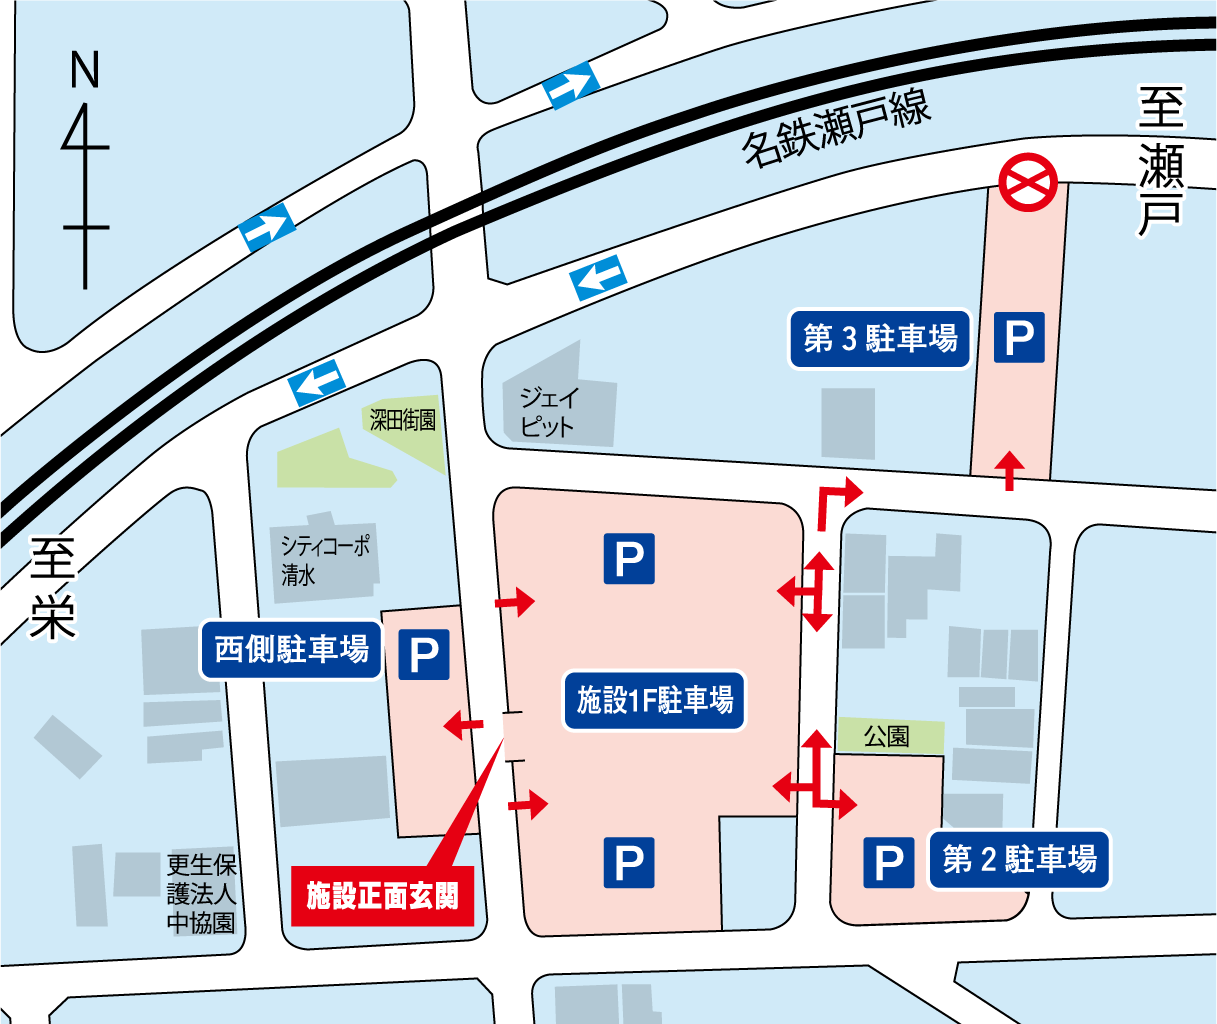 ahpf_parking_map